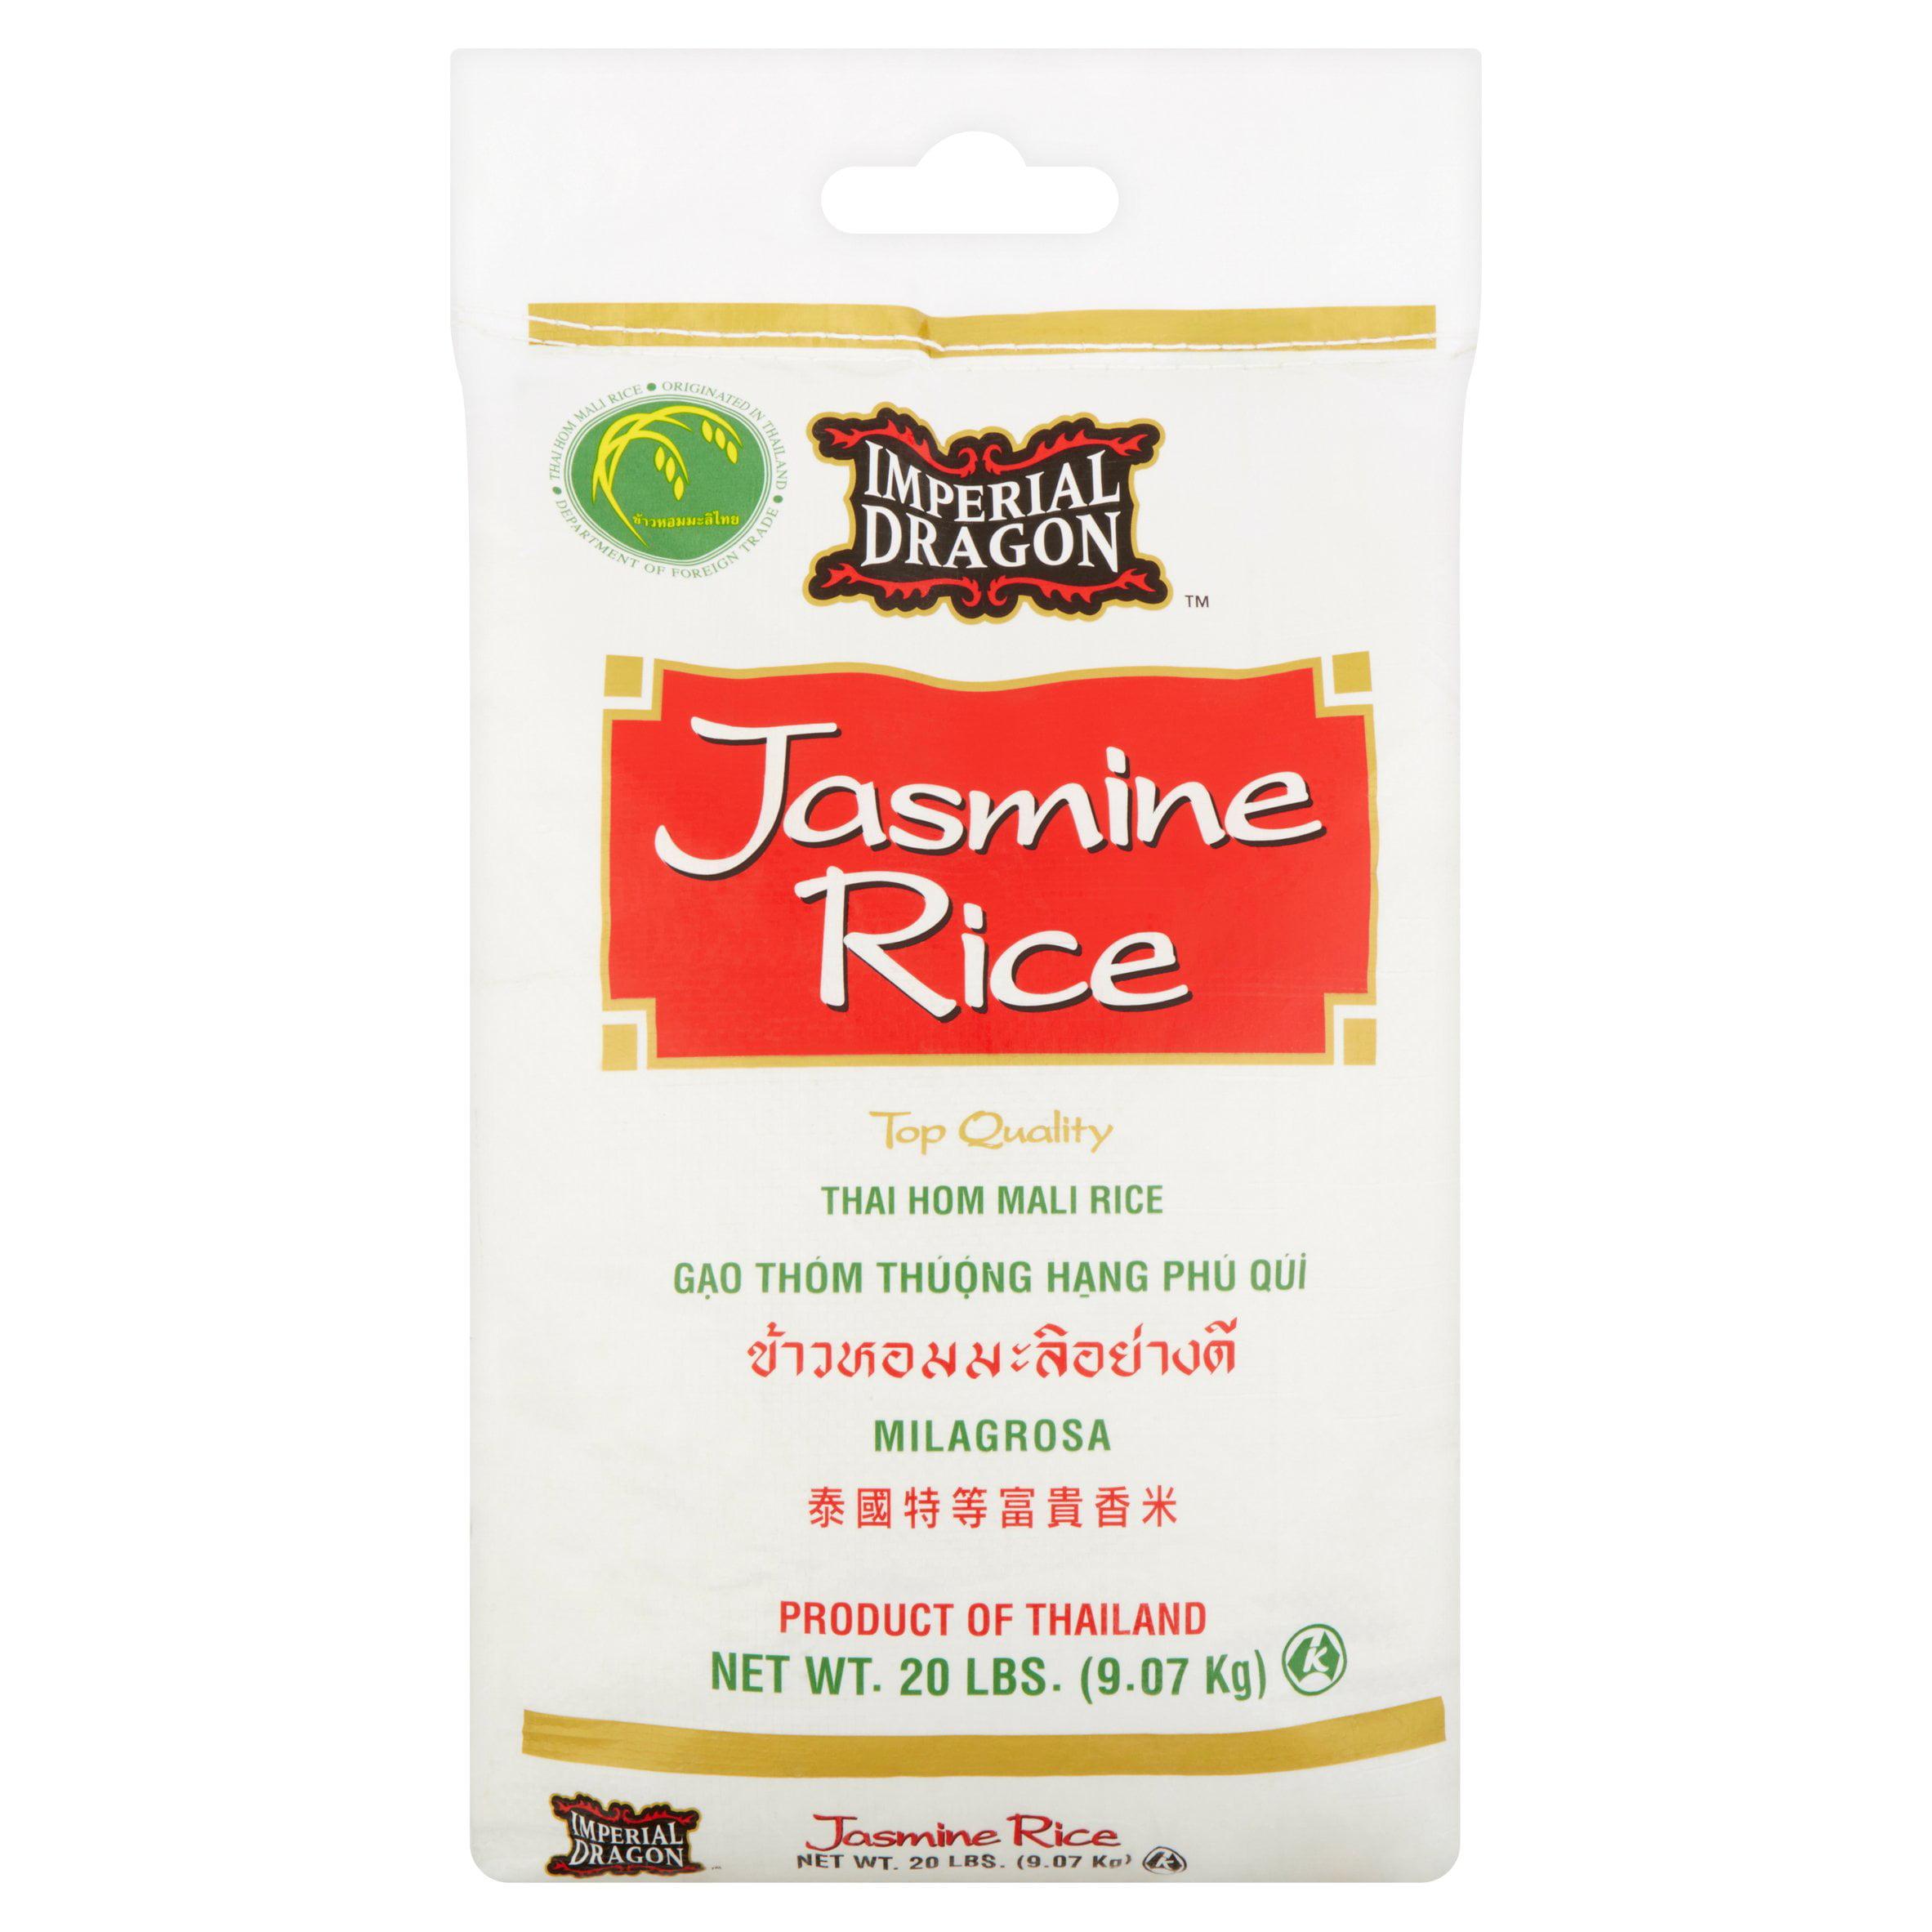 Imperial Dragon Jasmine Rice, 20 Lb - $0.9/lb